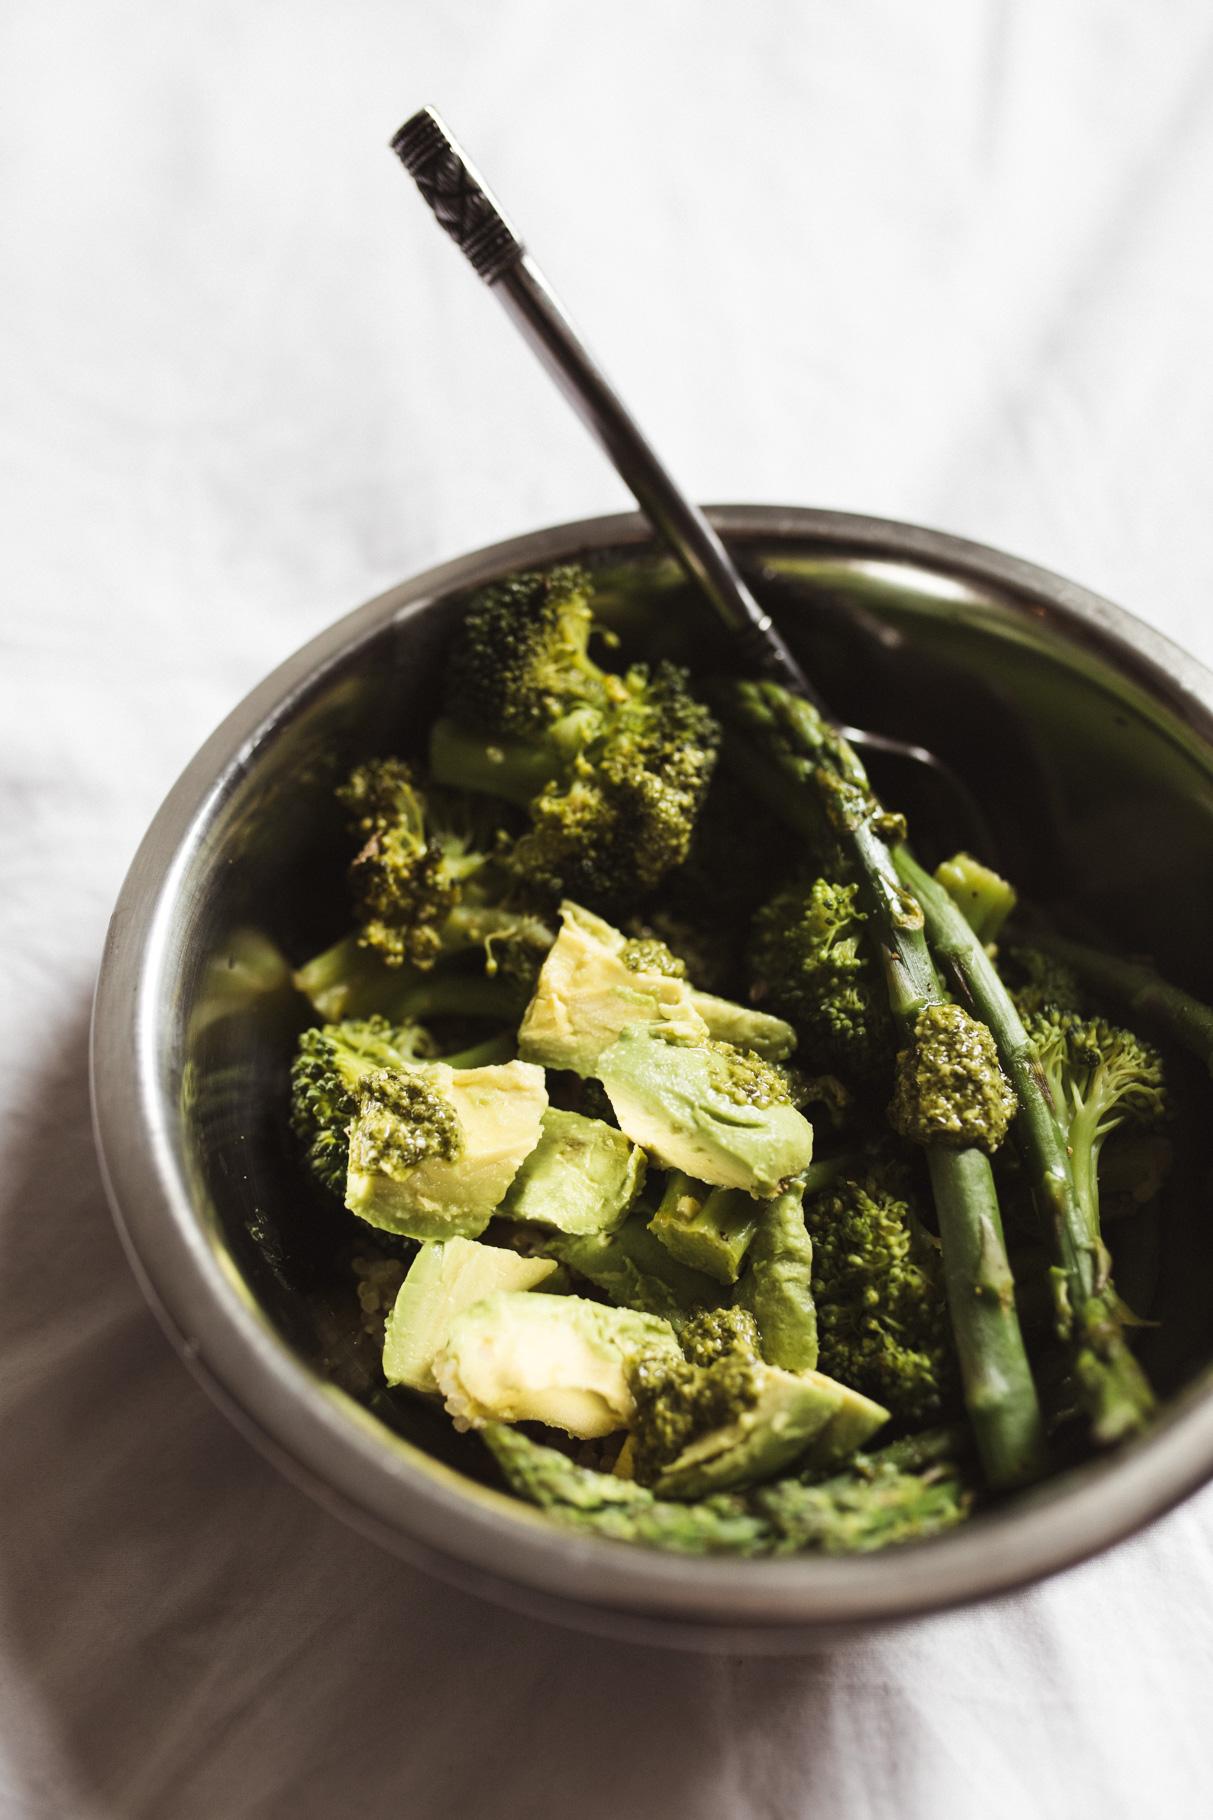 vegan, spargel, quinoa, avocado, brokkoli, rezept, gluten frei, free, annalaurakummer, lunch bowl